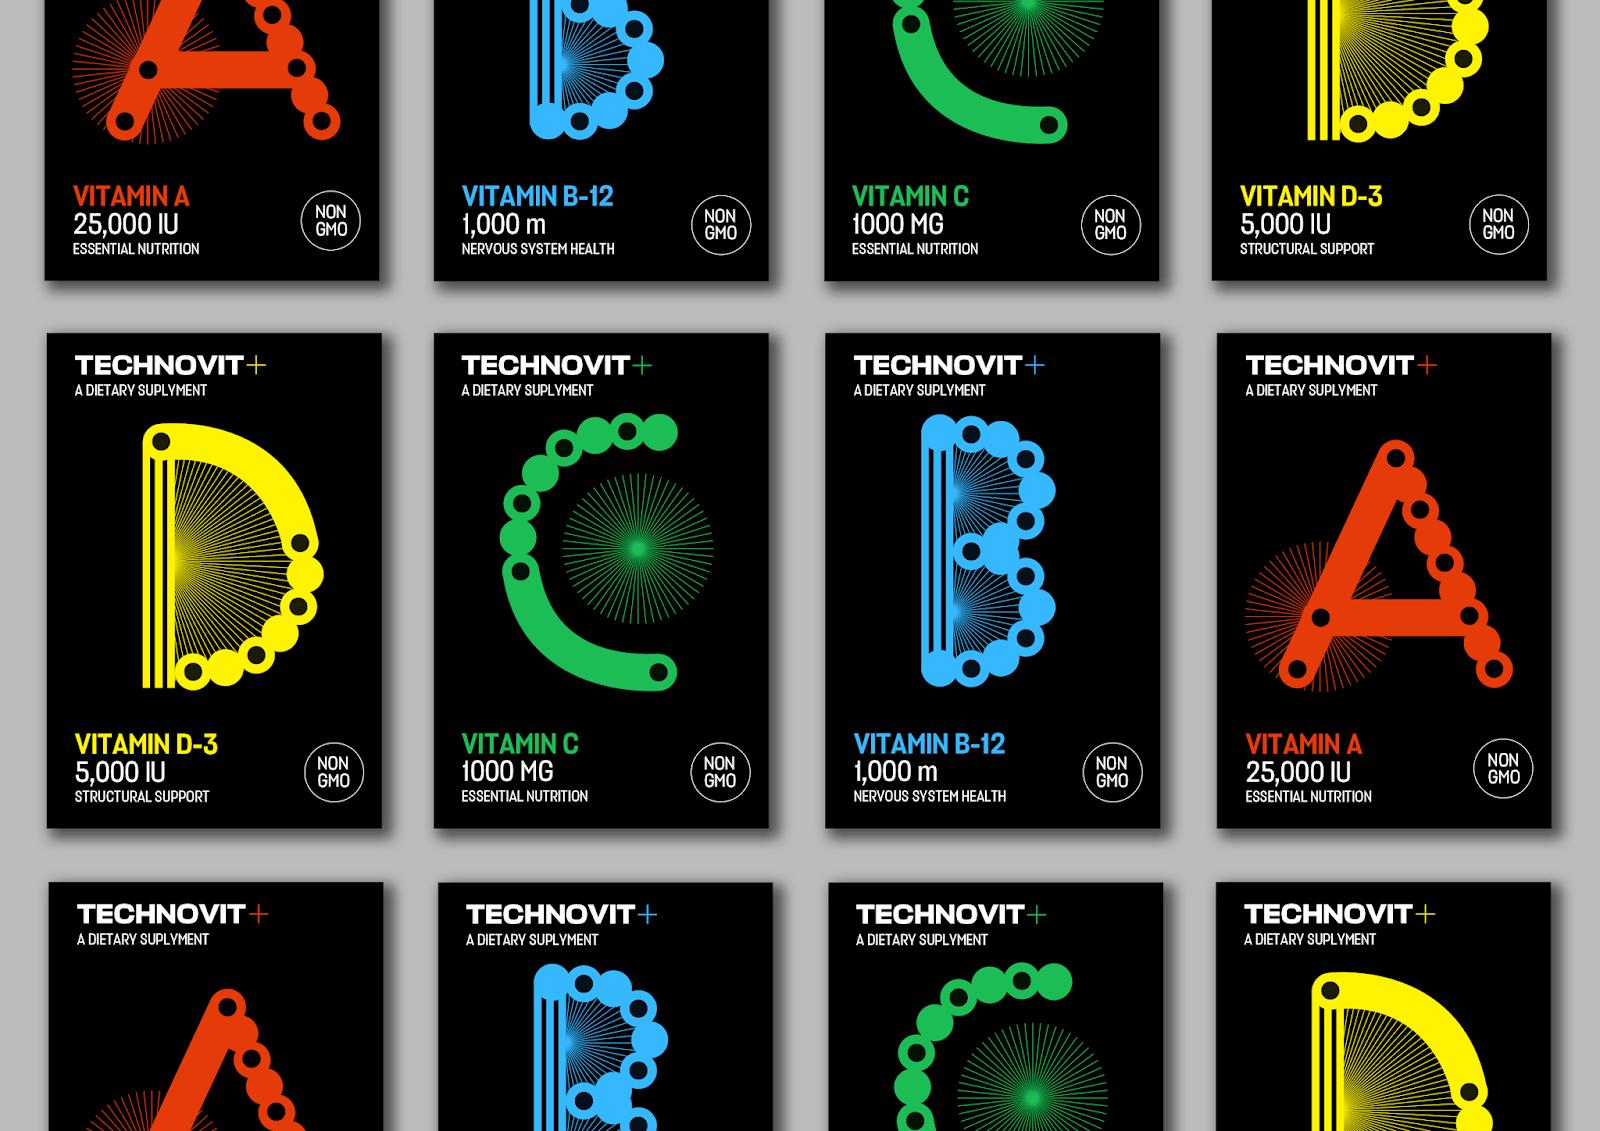 "TECHNDVIT维生素包装设计""字母风格"",源自电子音乐的的明亮全息图像和配色"